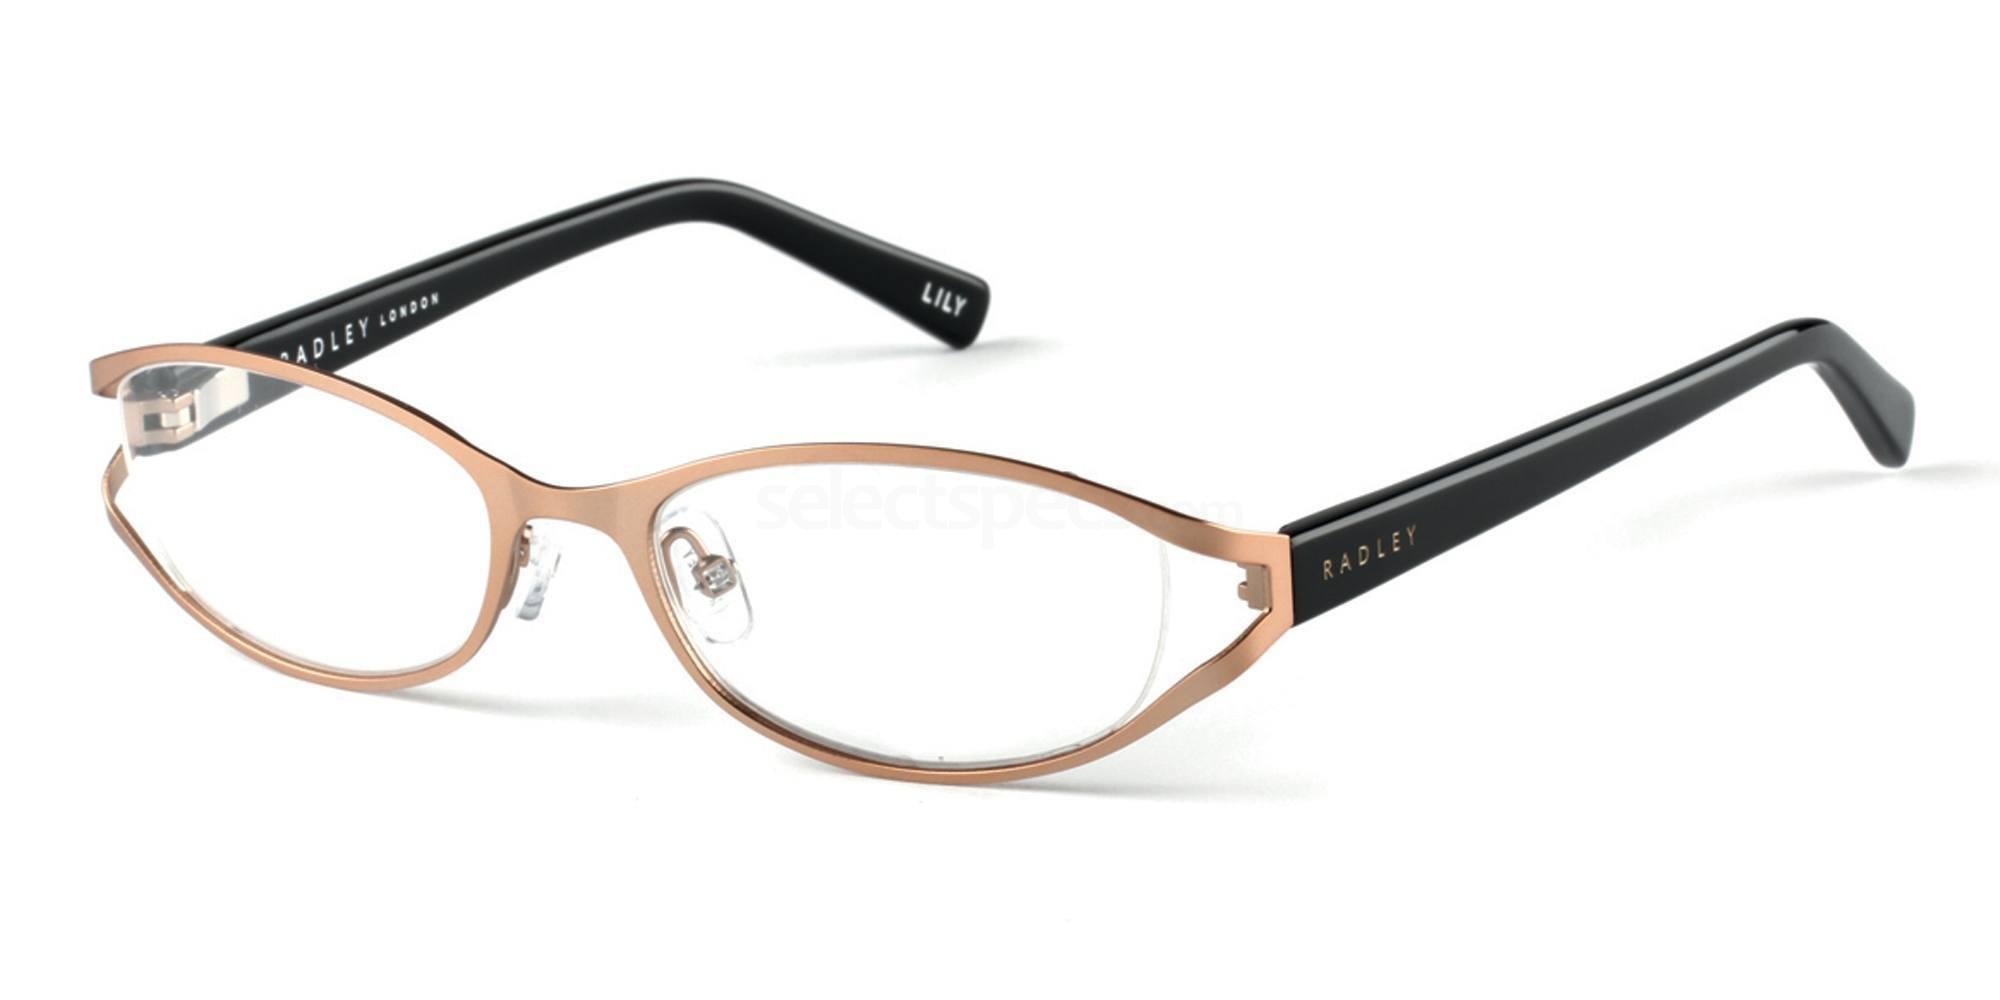 072 RDO-LILY Glasses, Radley London